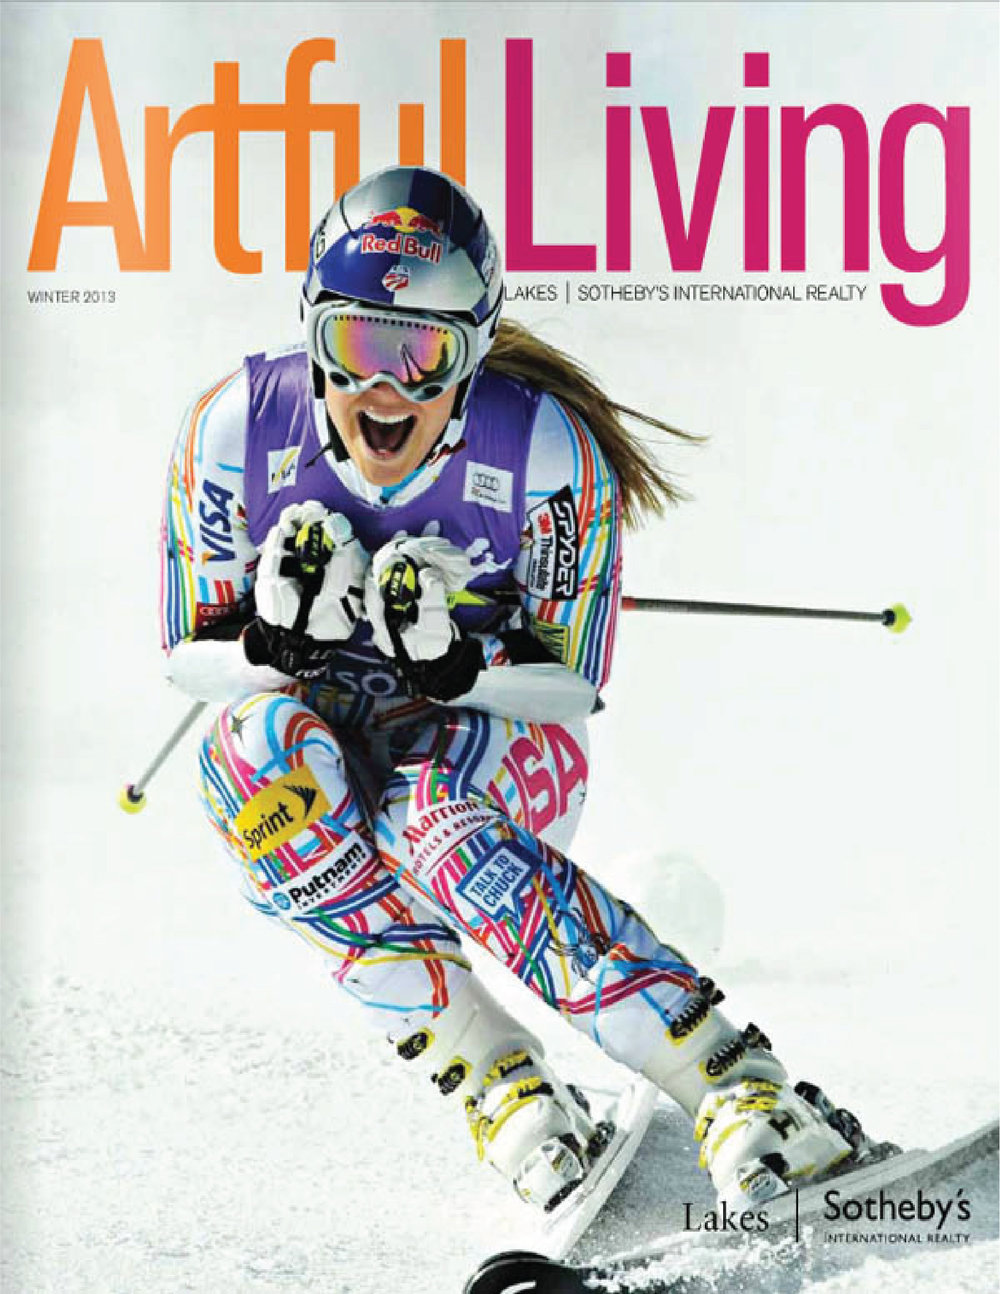 Magazine Covers_2013_Artful Living.jpg